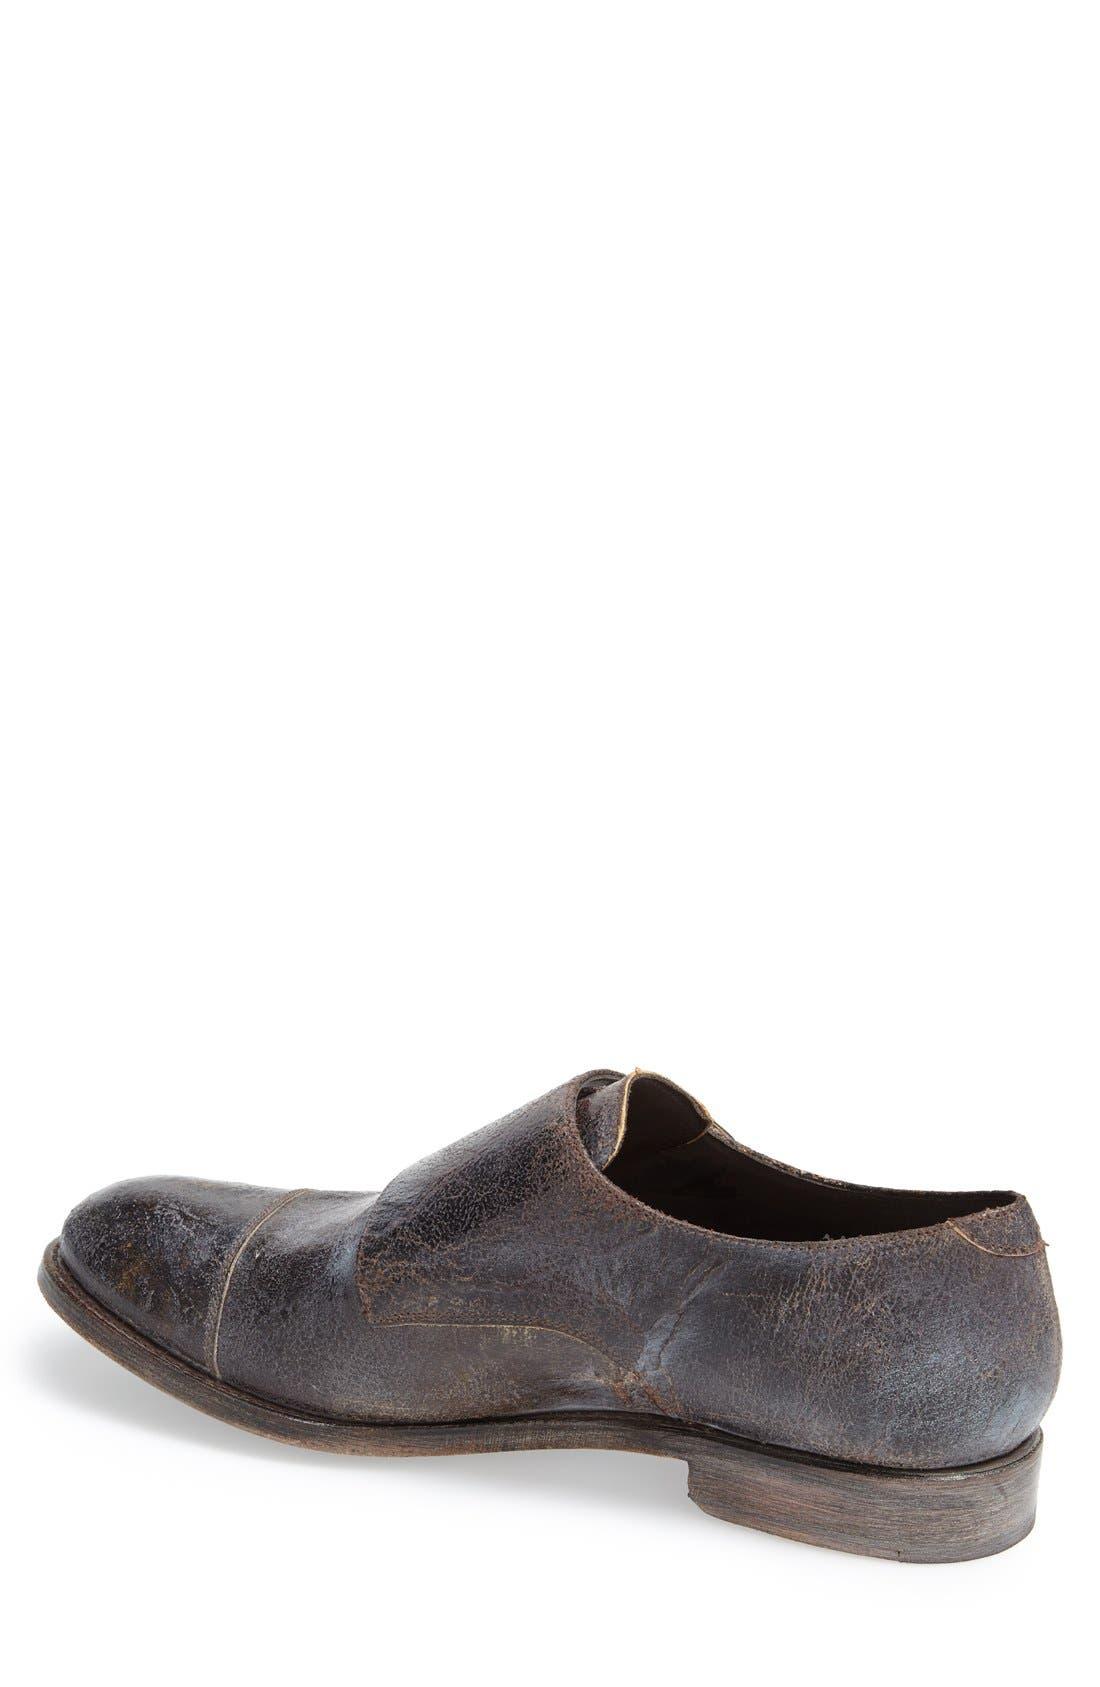 Boots 'Friar Tuk' Double Monk Strap Shoe,                             Alternate thumbnail 2, color,                             200